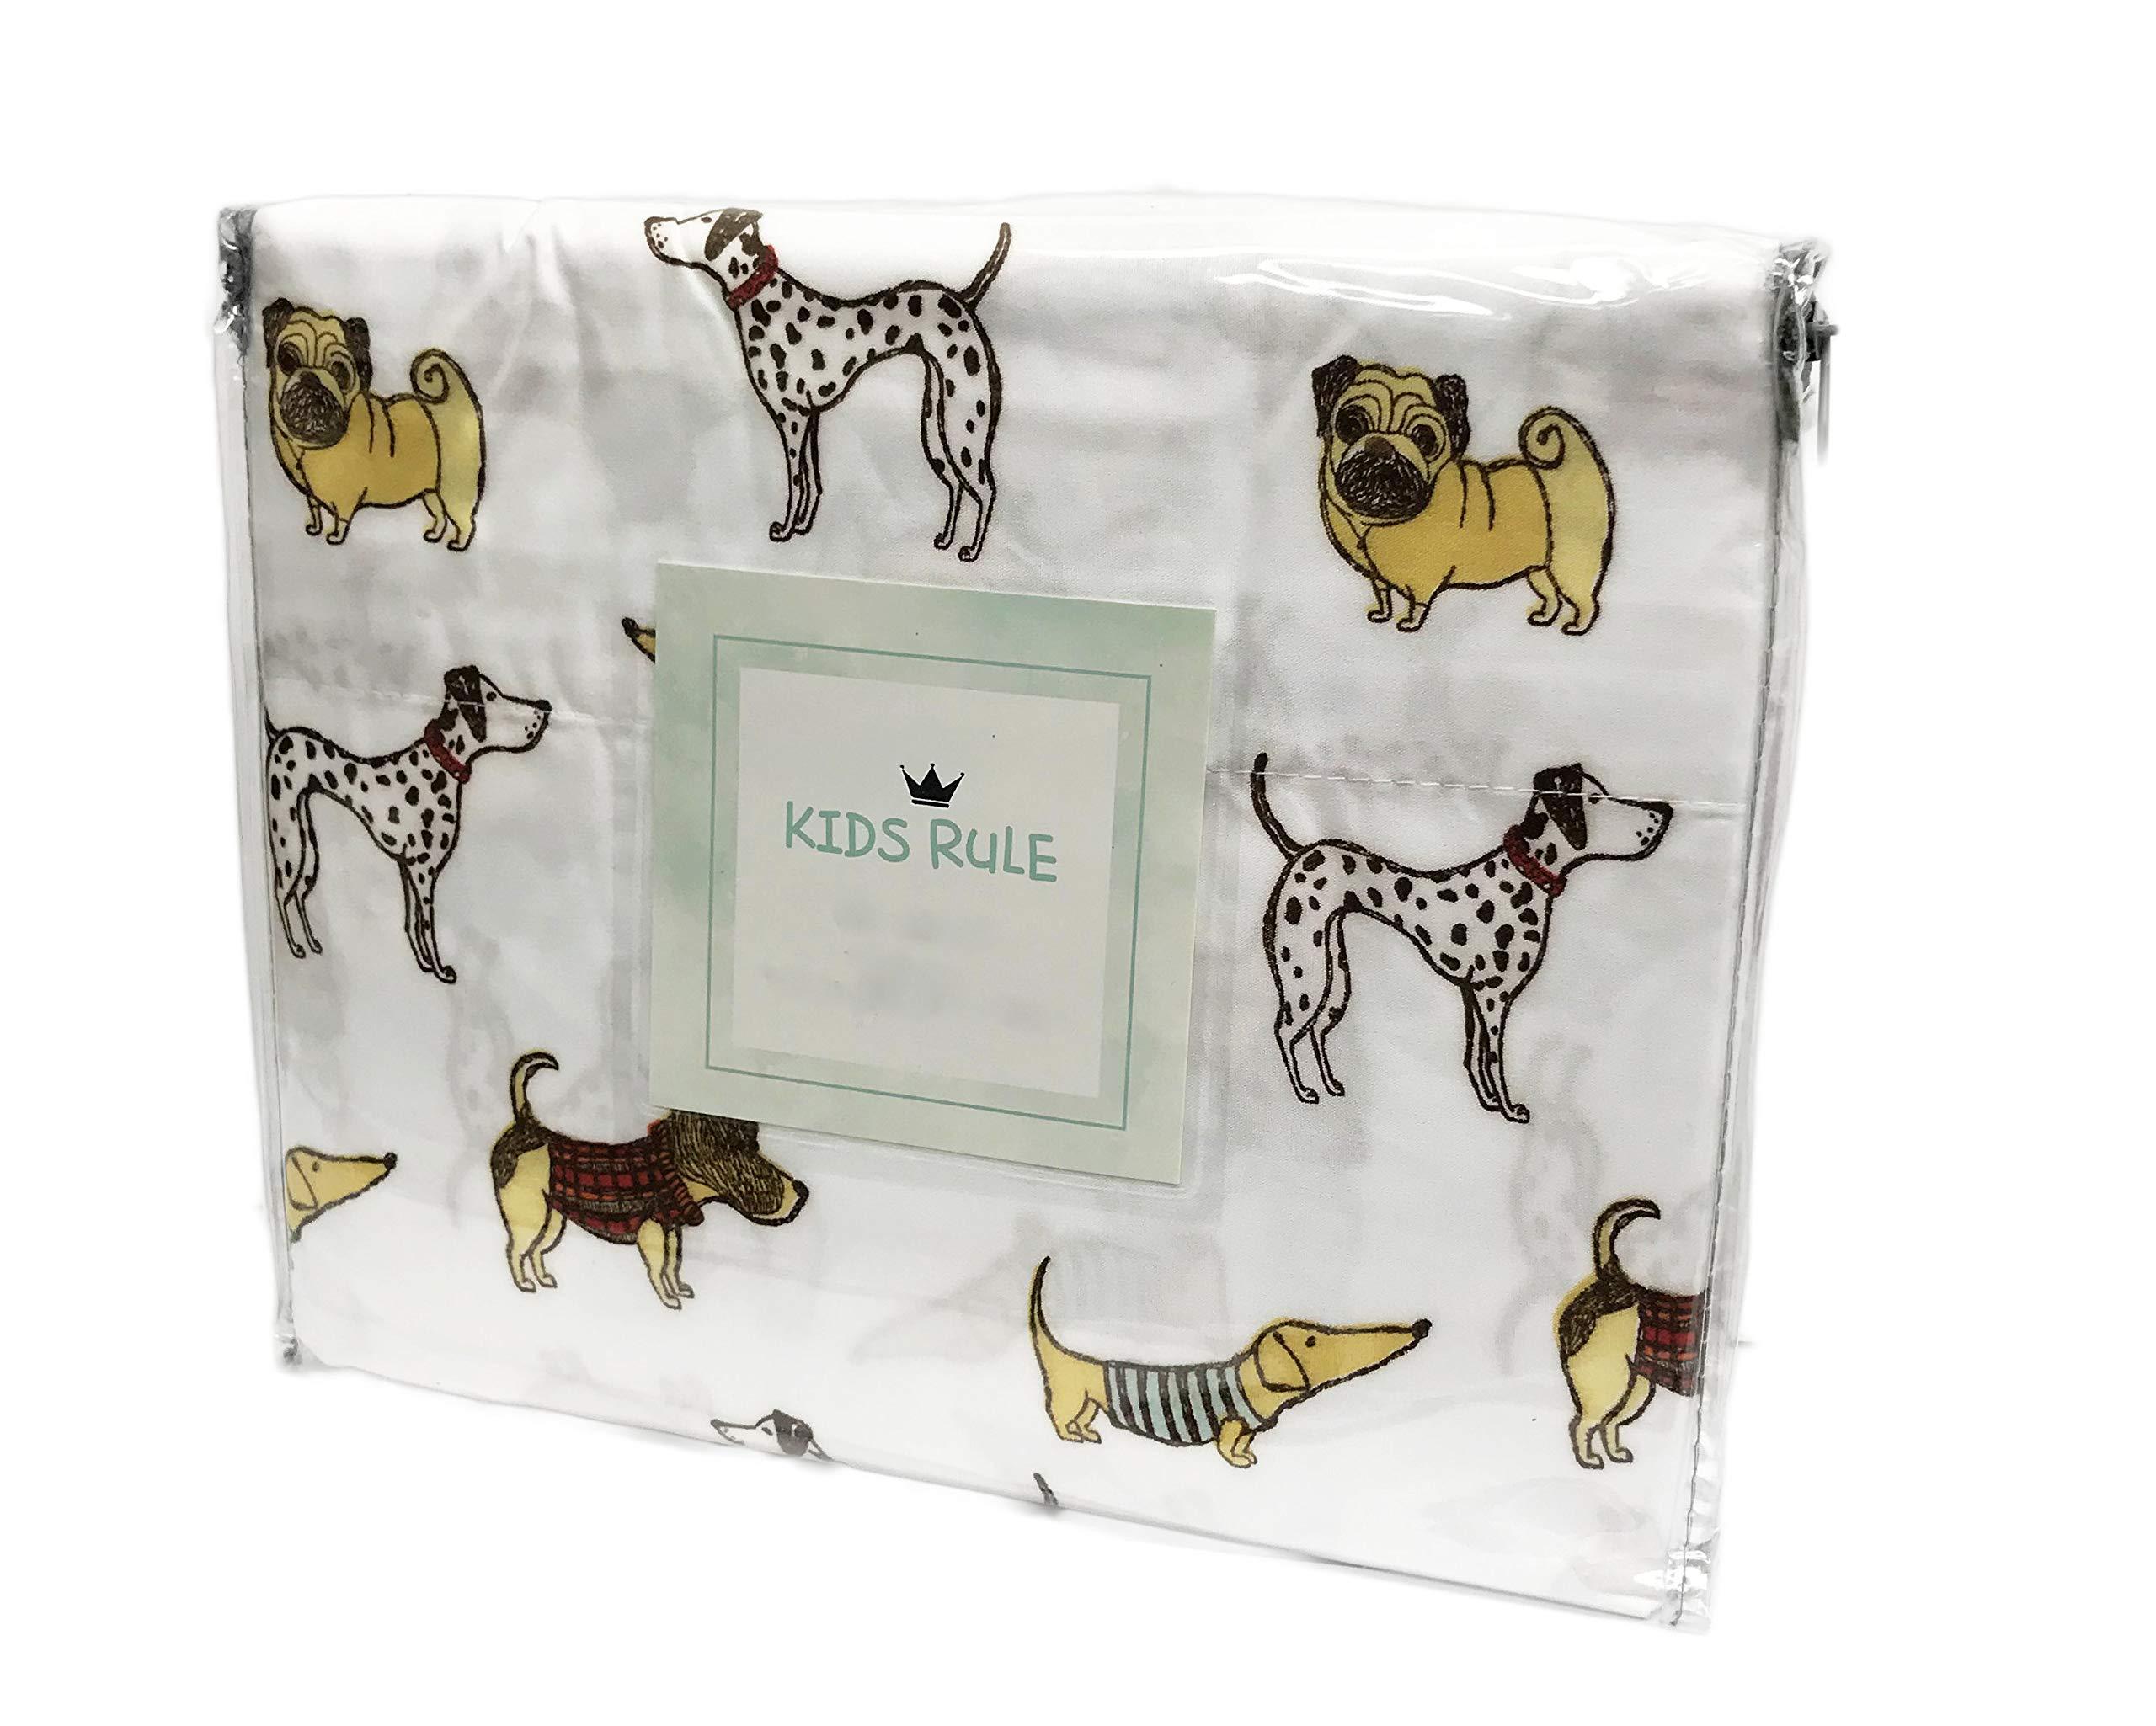 Cute Multi Dog Breeds Dachshund Dalmatian Pug Novelty Kids Bedroom Sheet Set (Full)